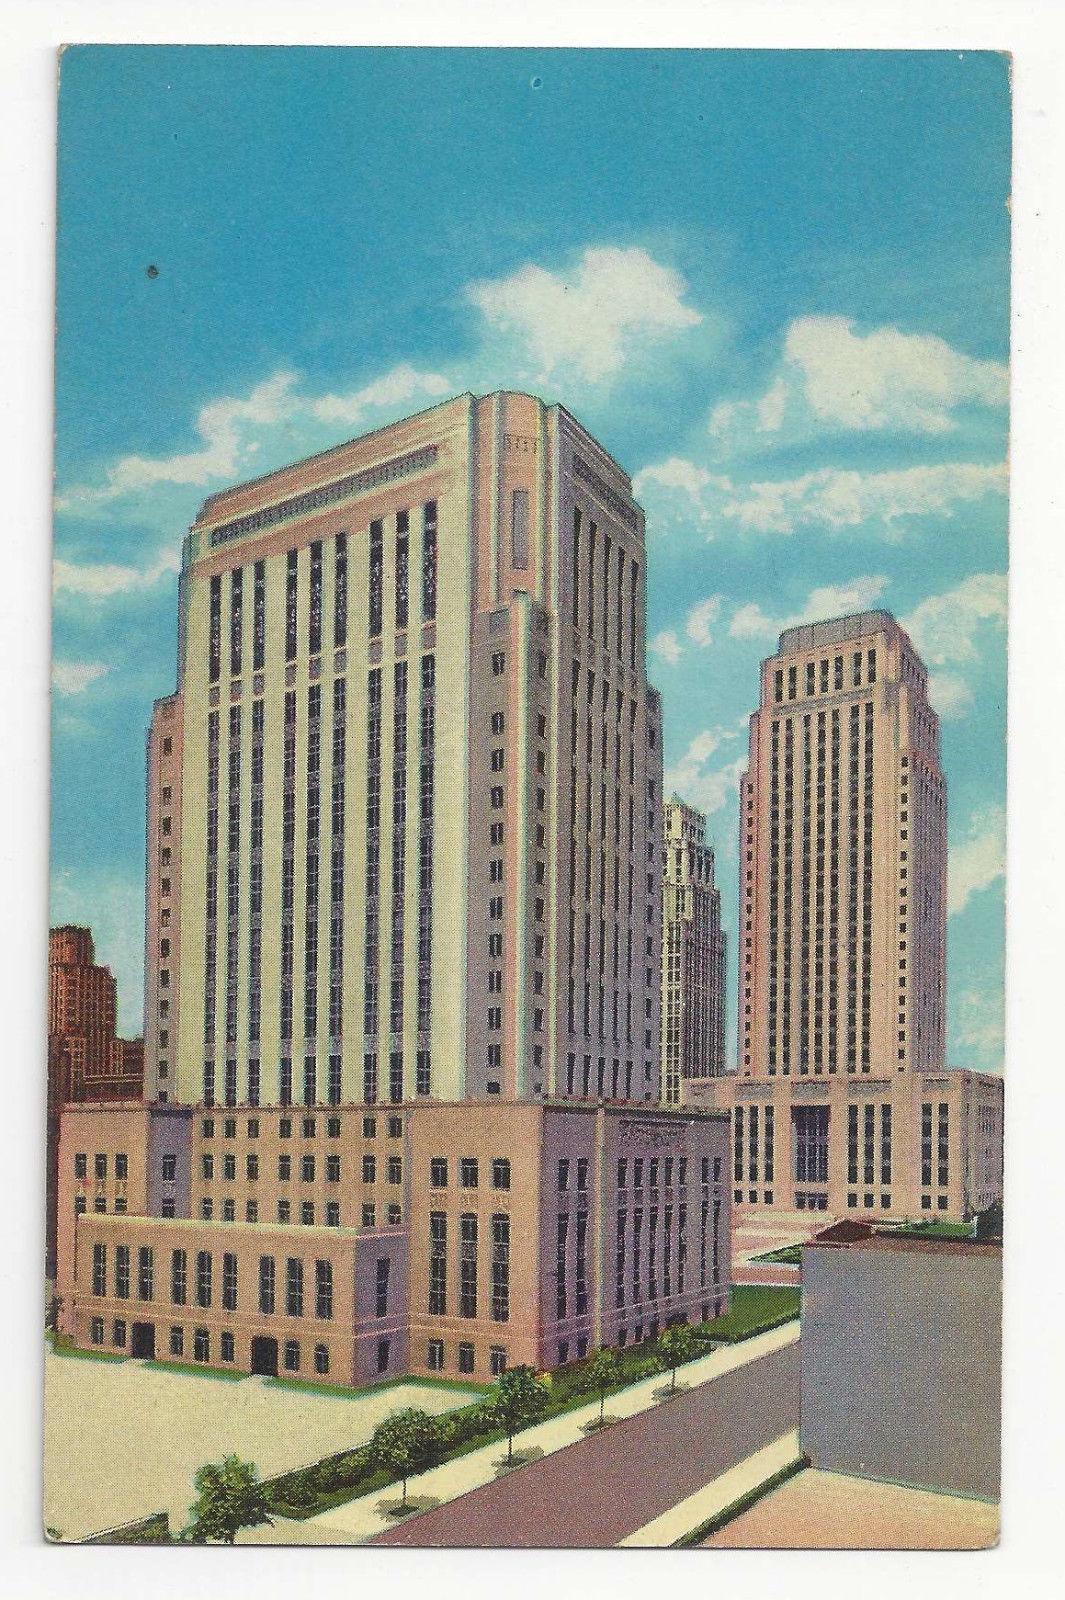 MO Kansas City Civic Center Jackson County Courthouse City Hall Vtg Postcard